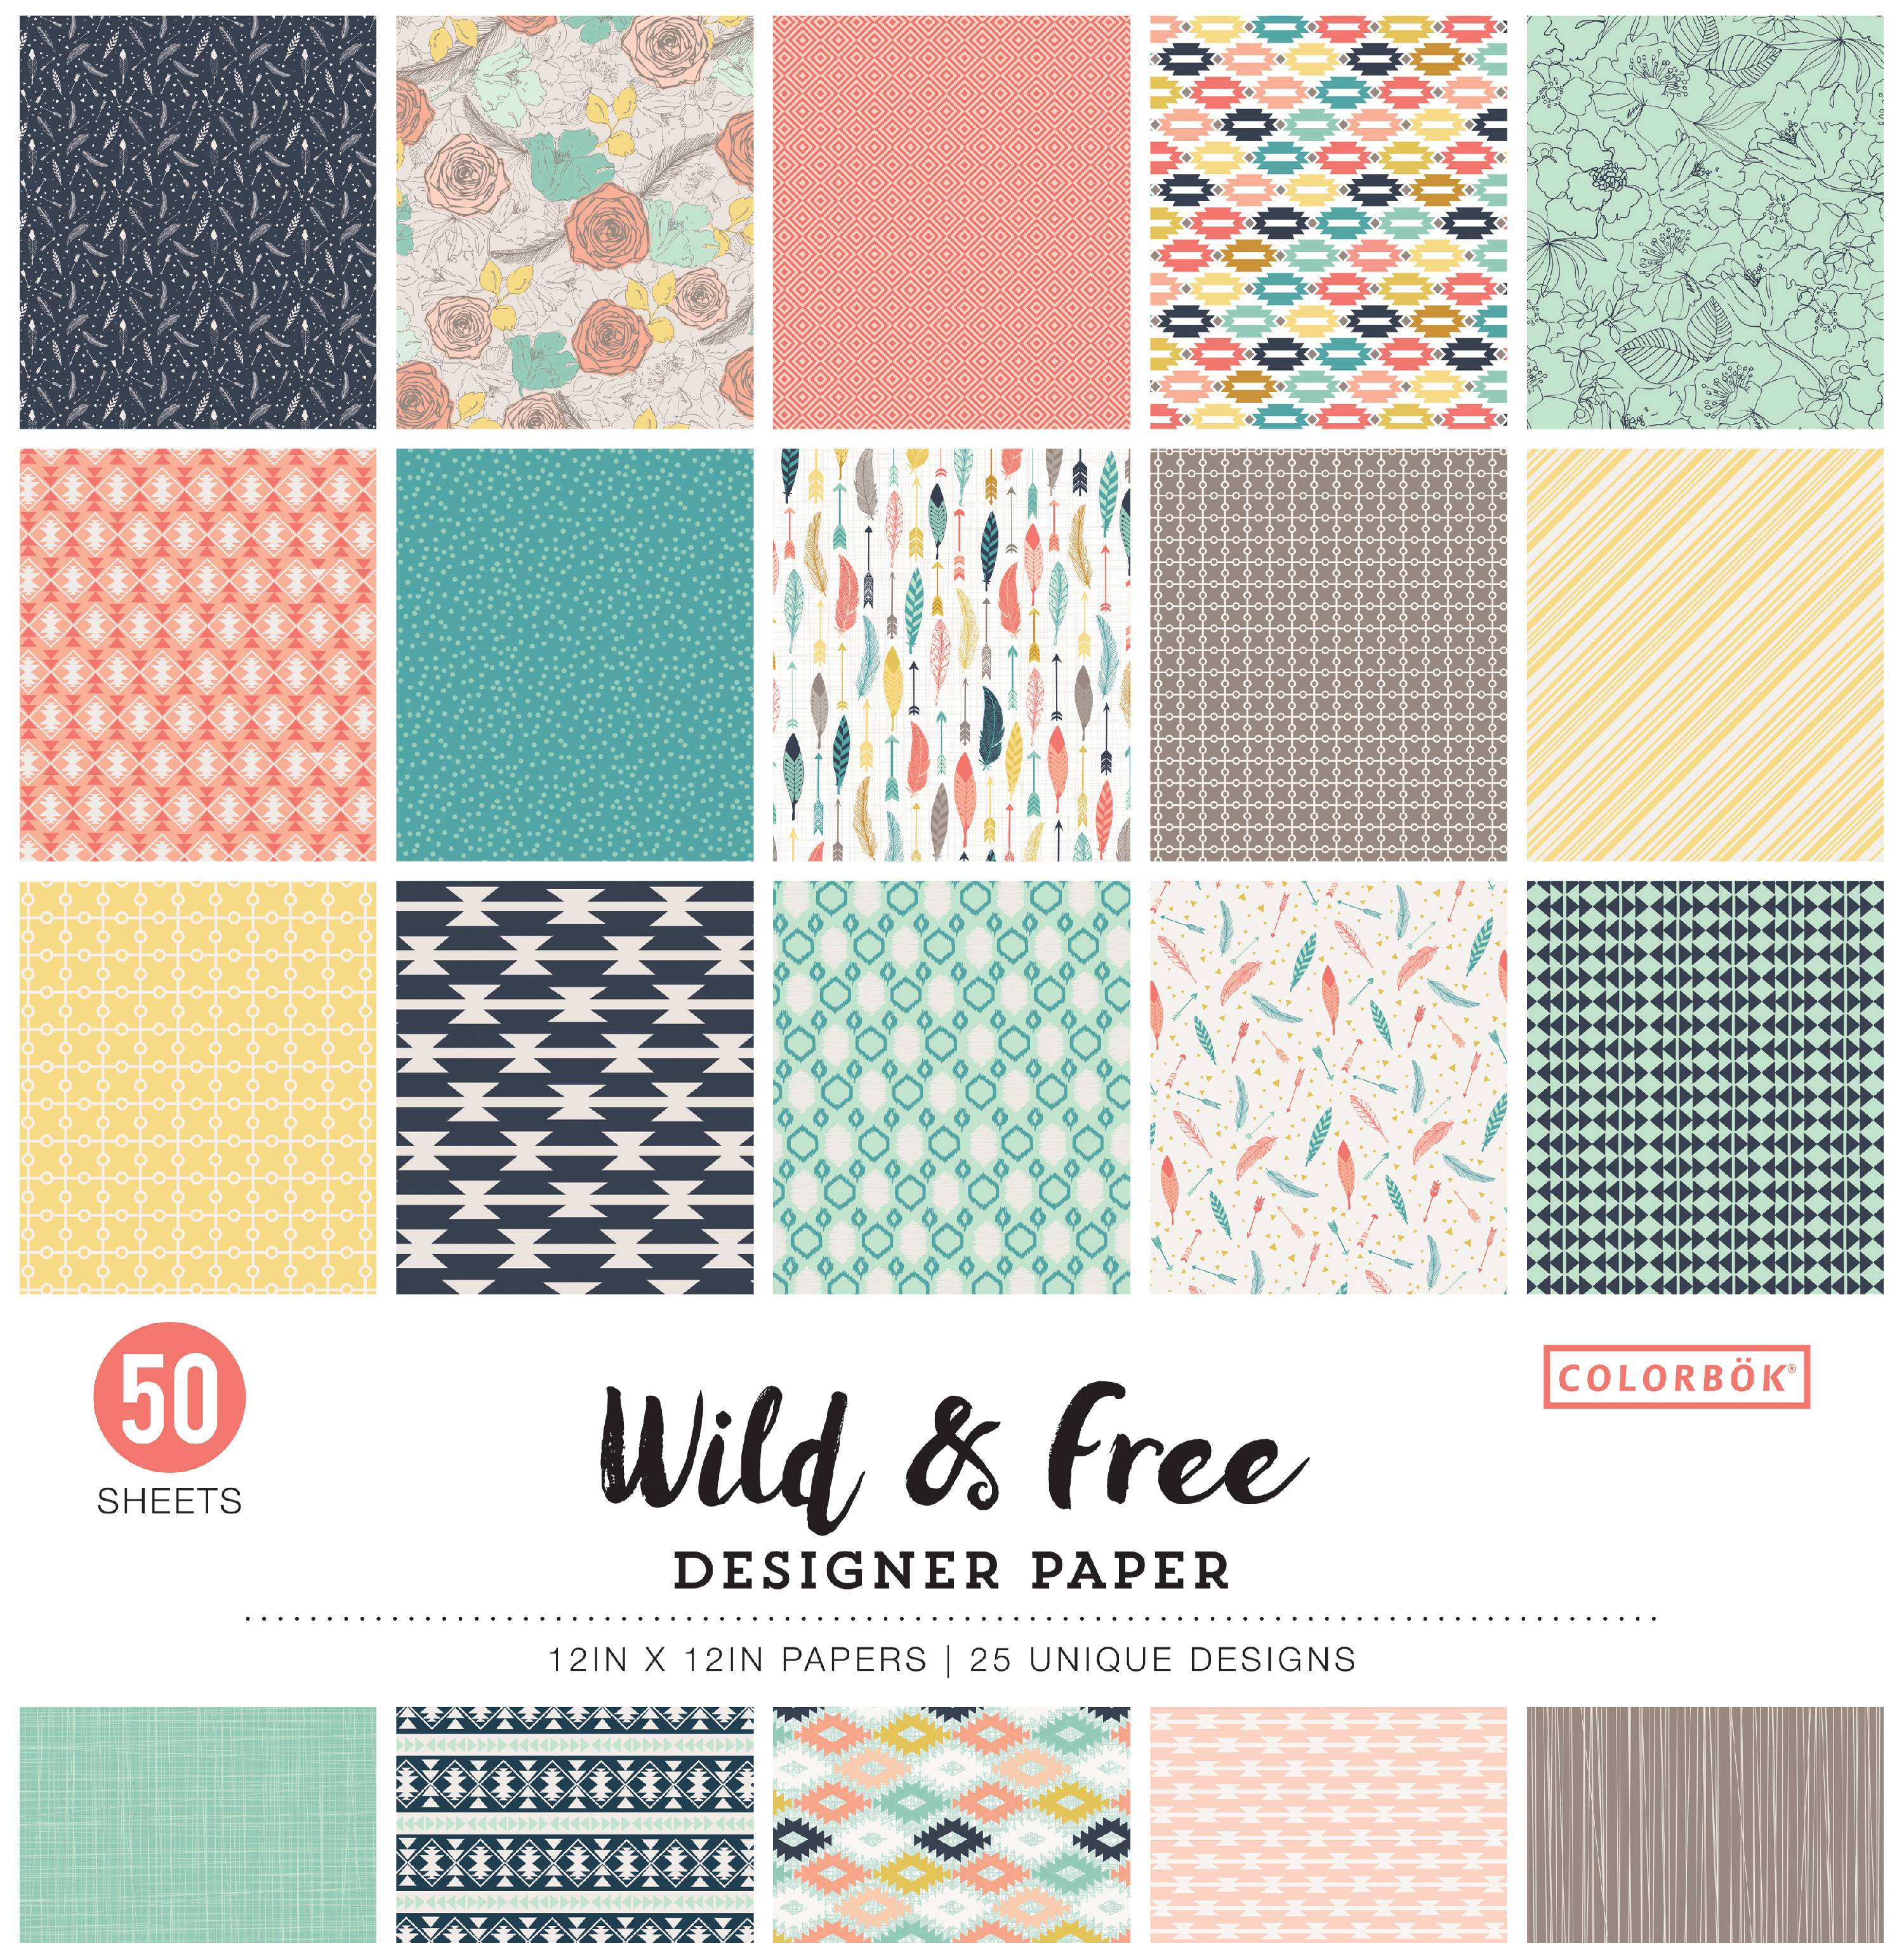 Colorbök® Wild & Free Designer Paper 50 sheet Pack